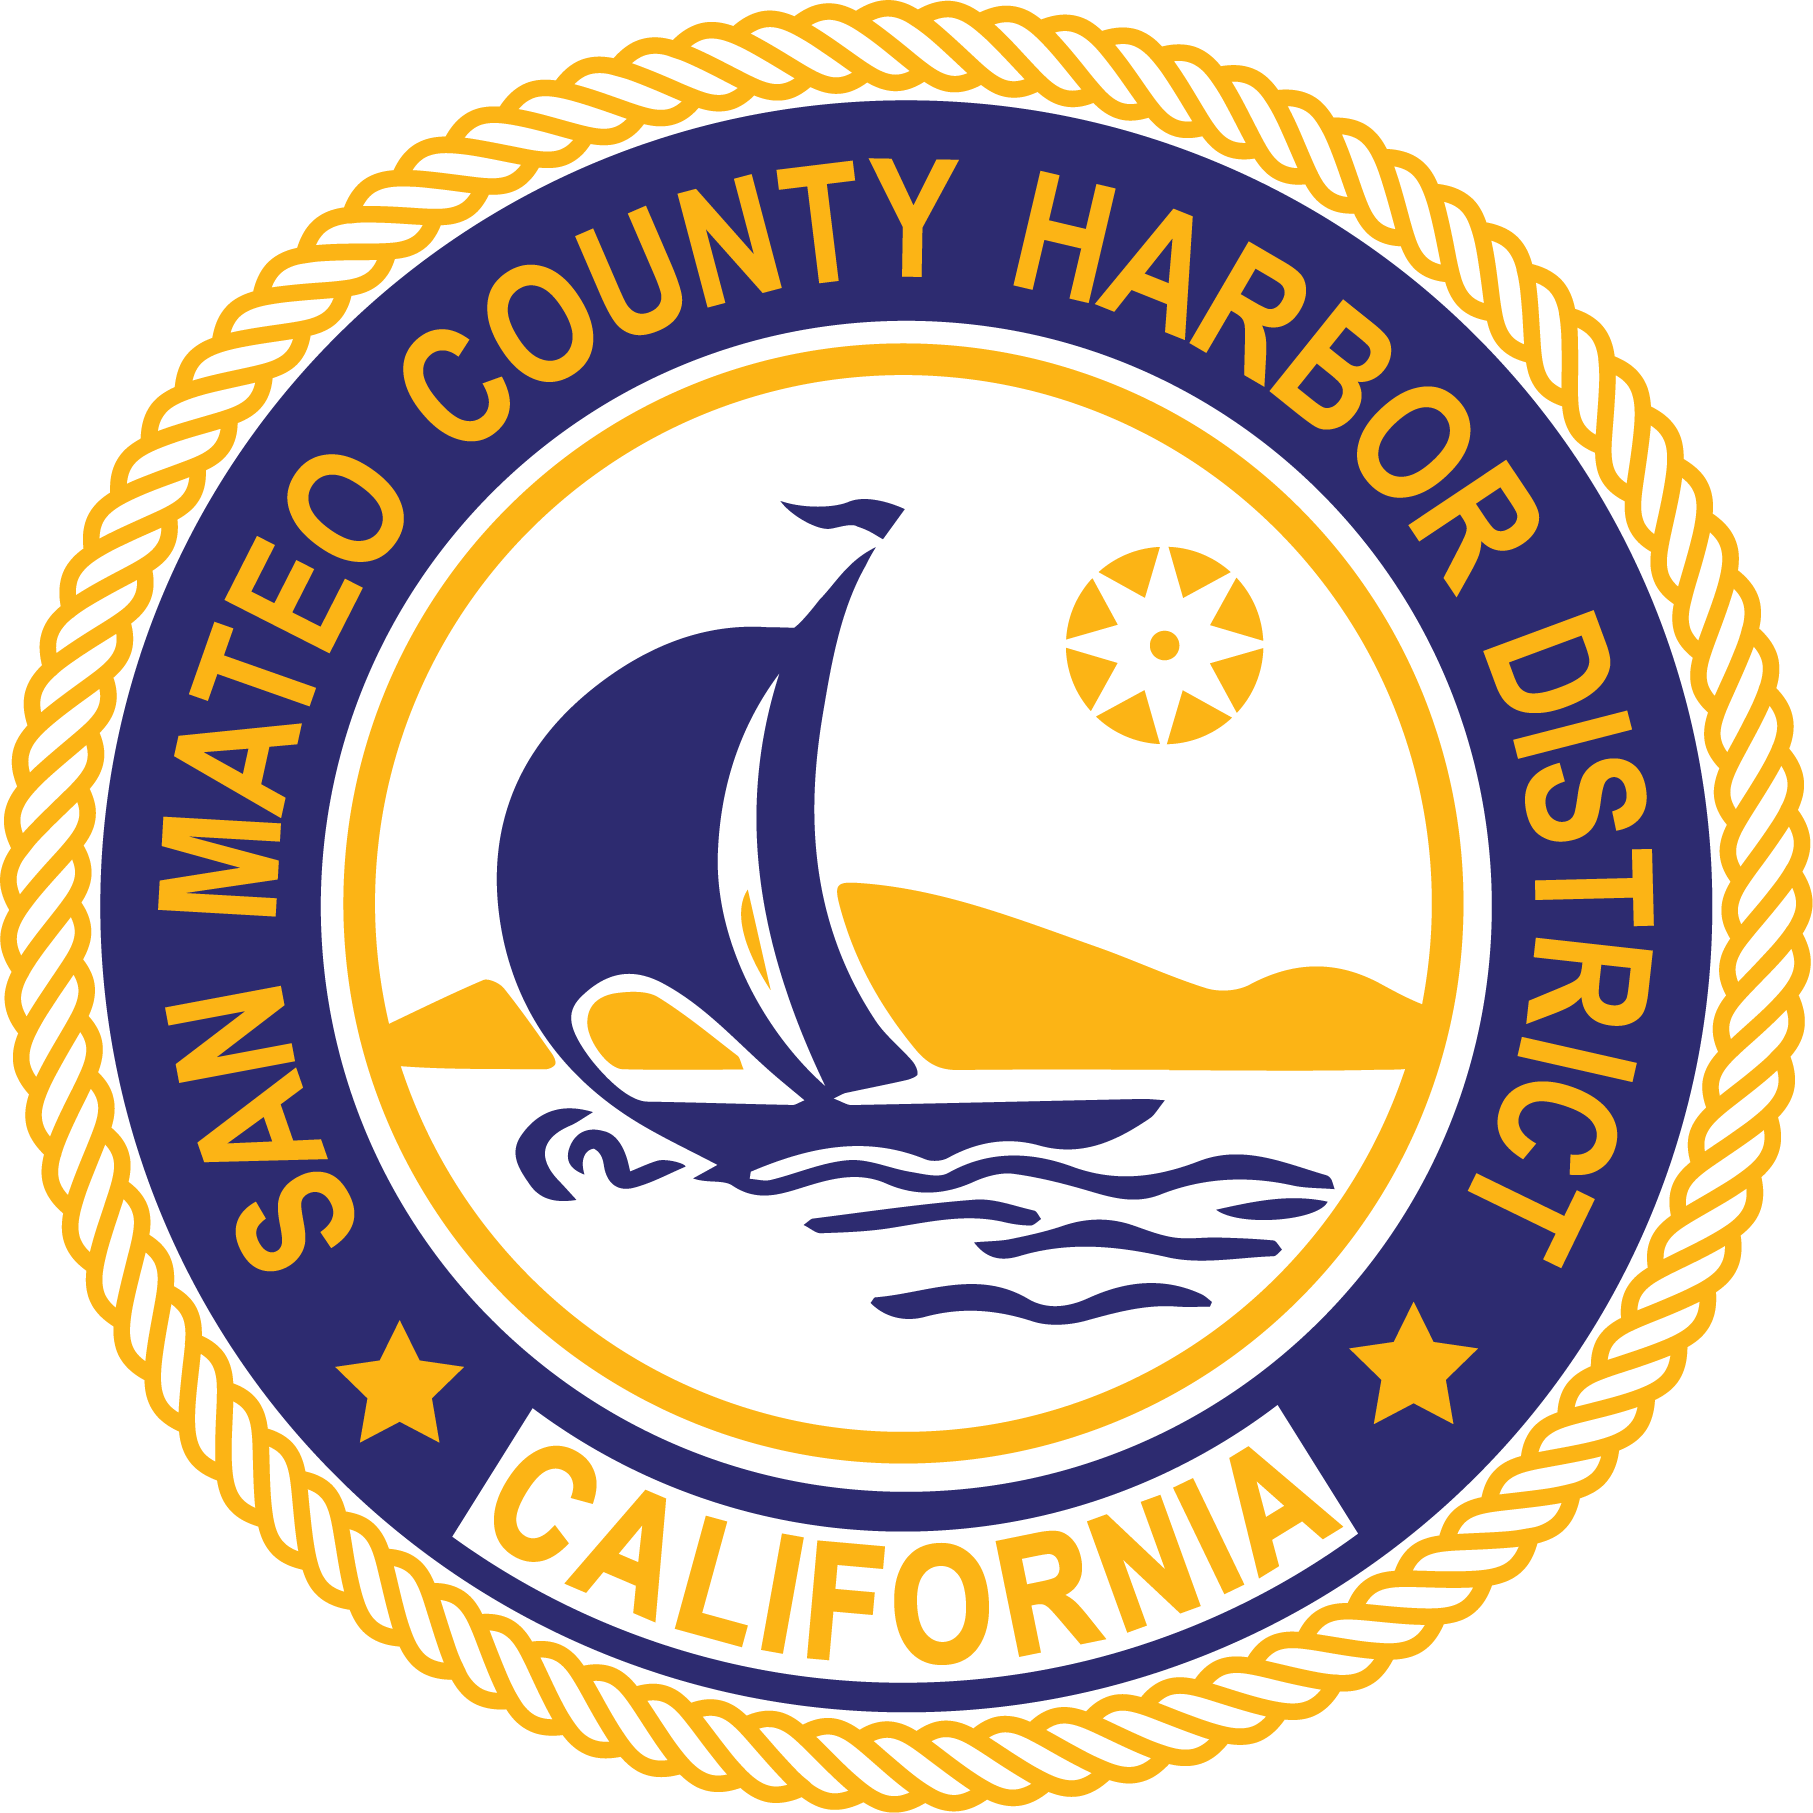 San Mateo County Harbor District